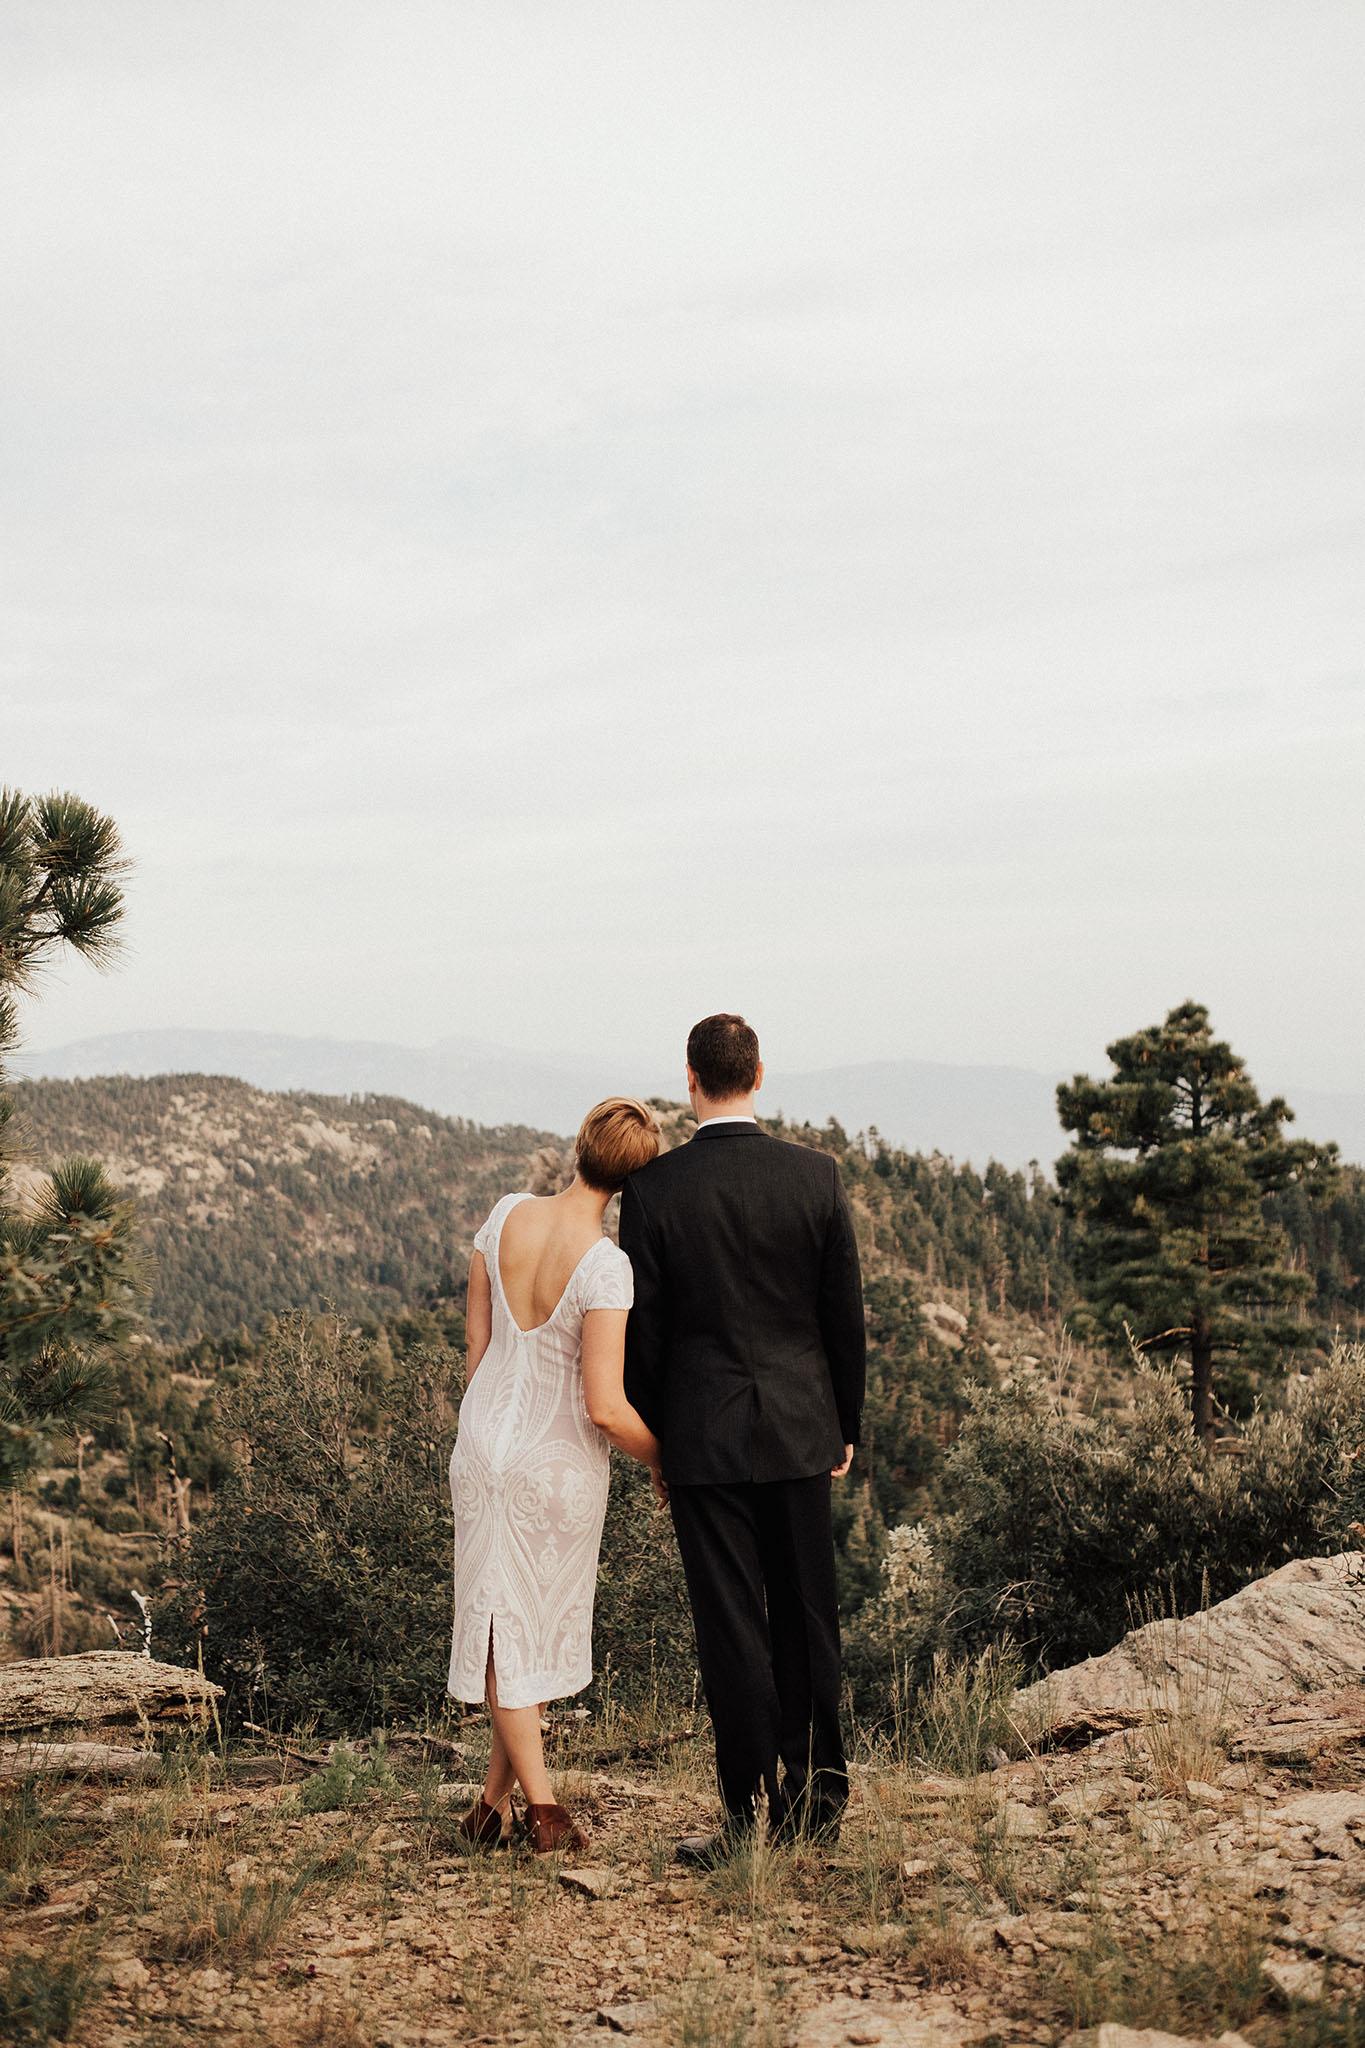 Arizona-Intimate-Elopement-Adventure-Photographer-Mount-Lemmon (16).jpg